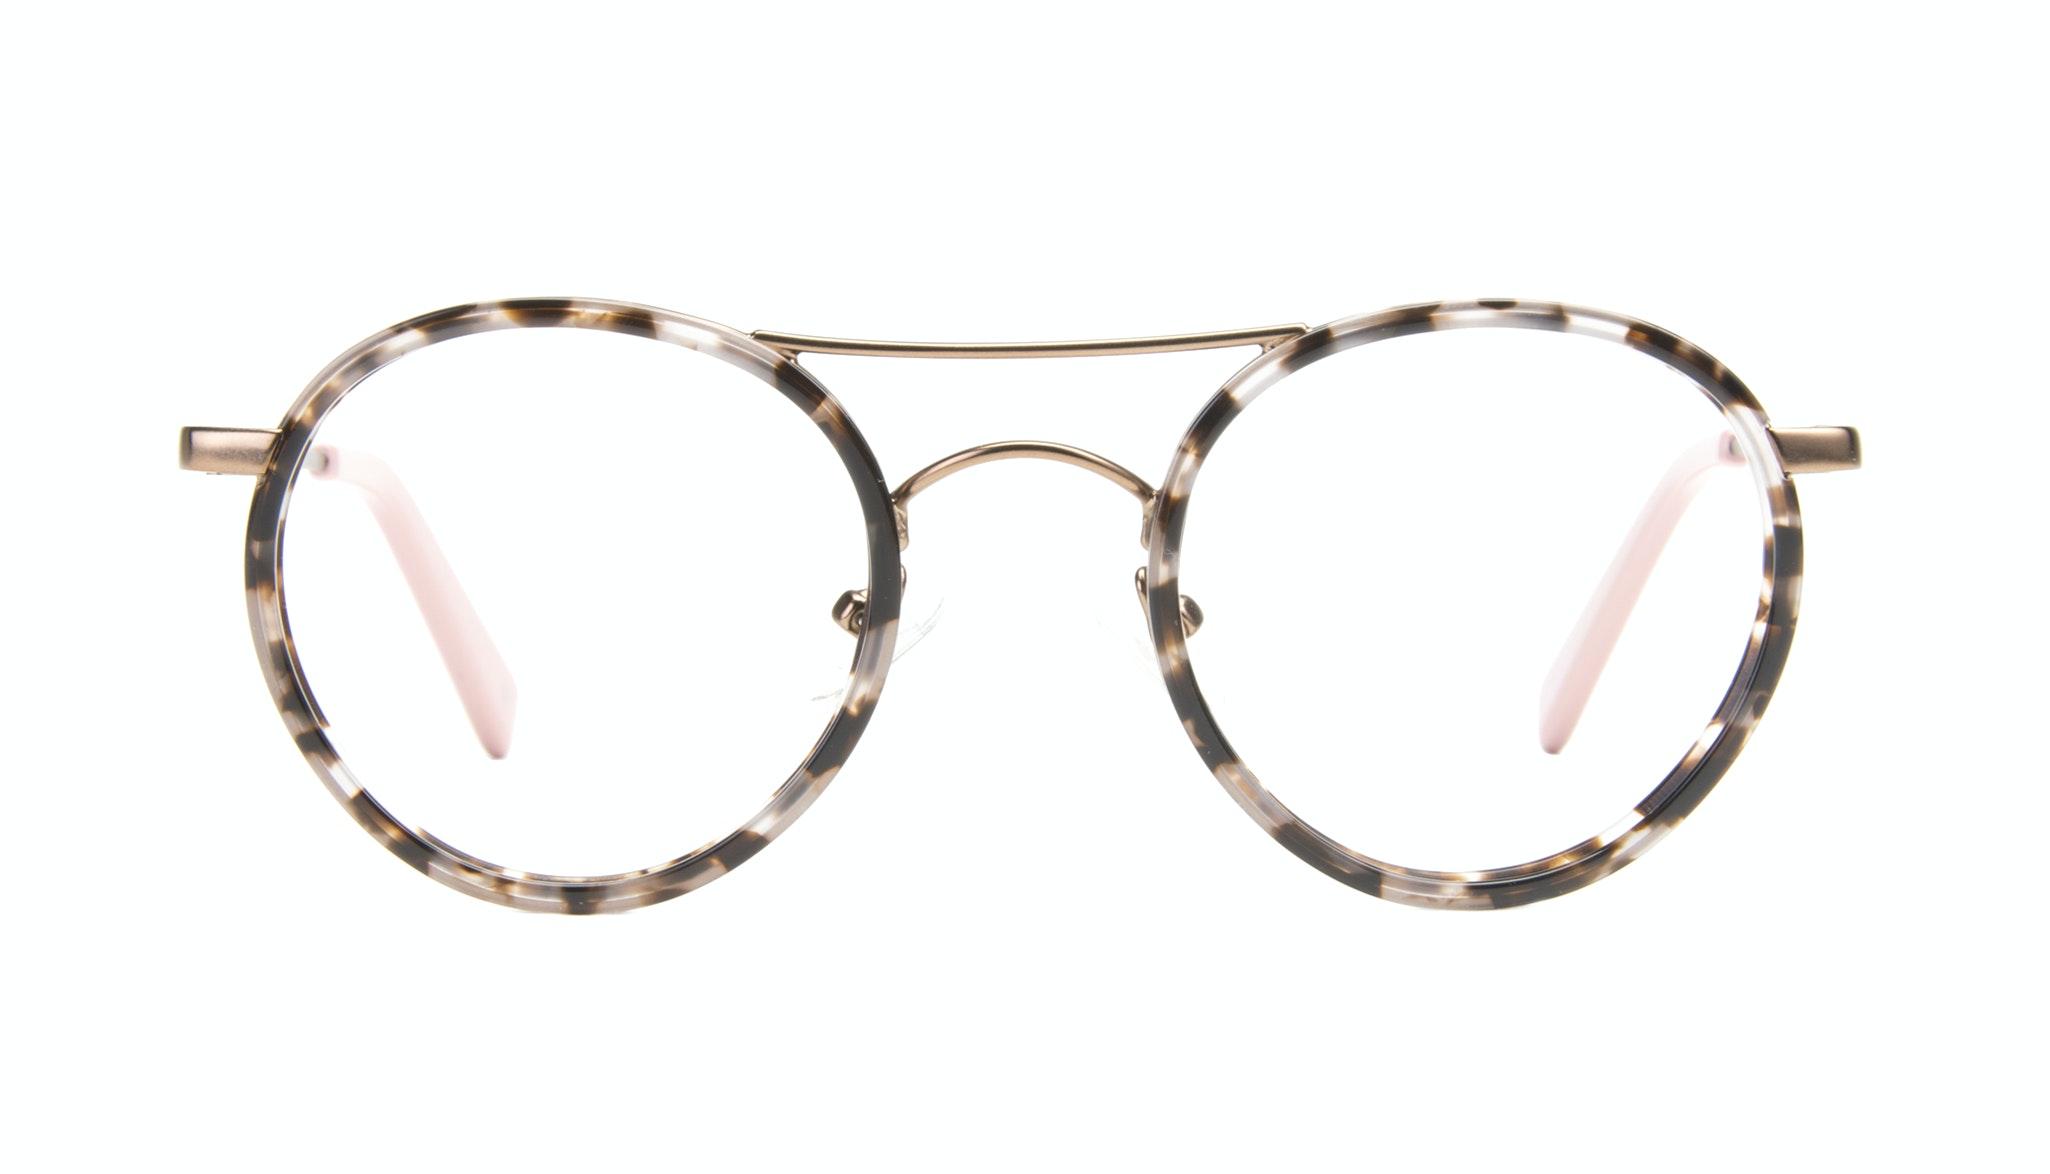 Affordable Fashion Glasses Aviator Round Eyeglasses Women Chelsea Pink Tortoise Front